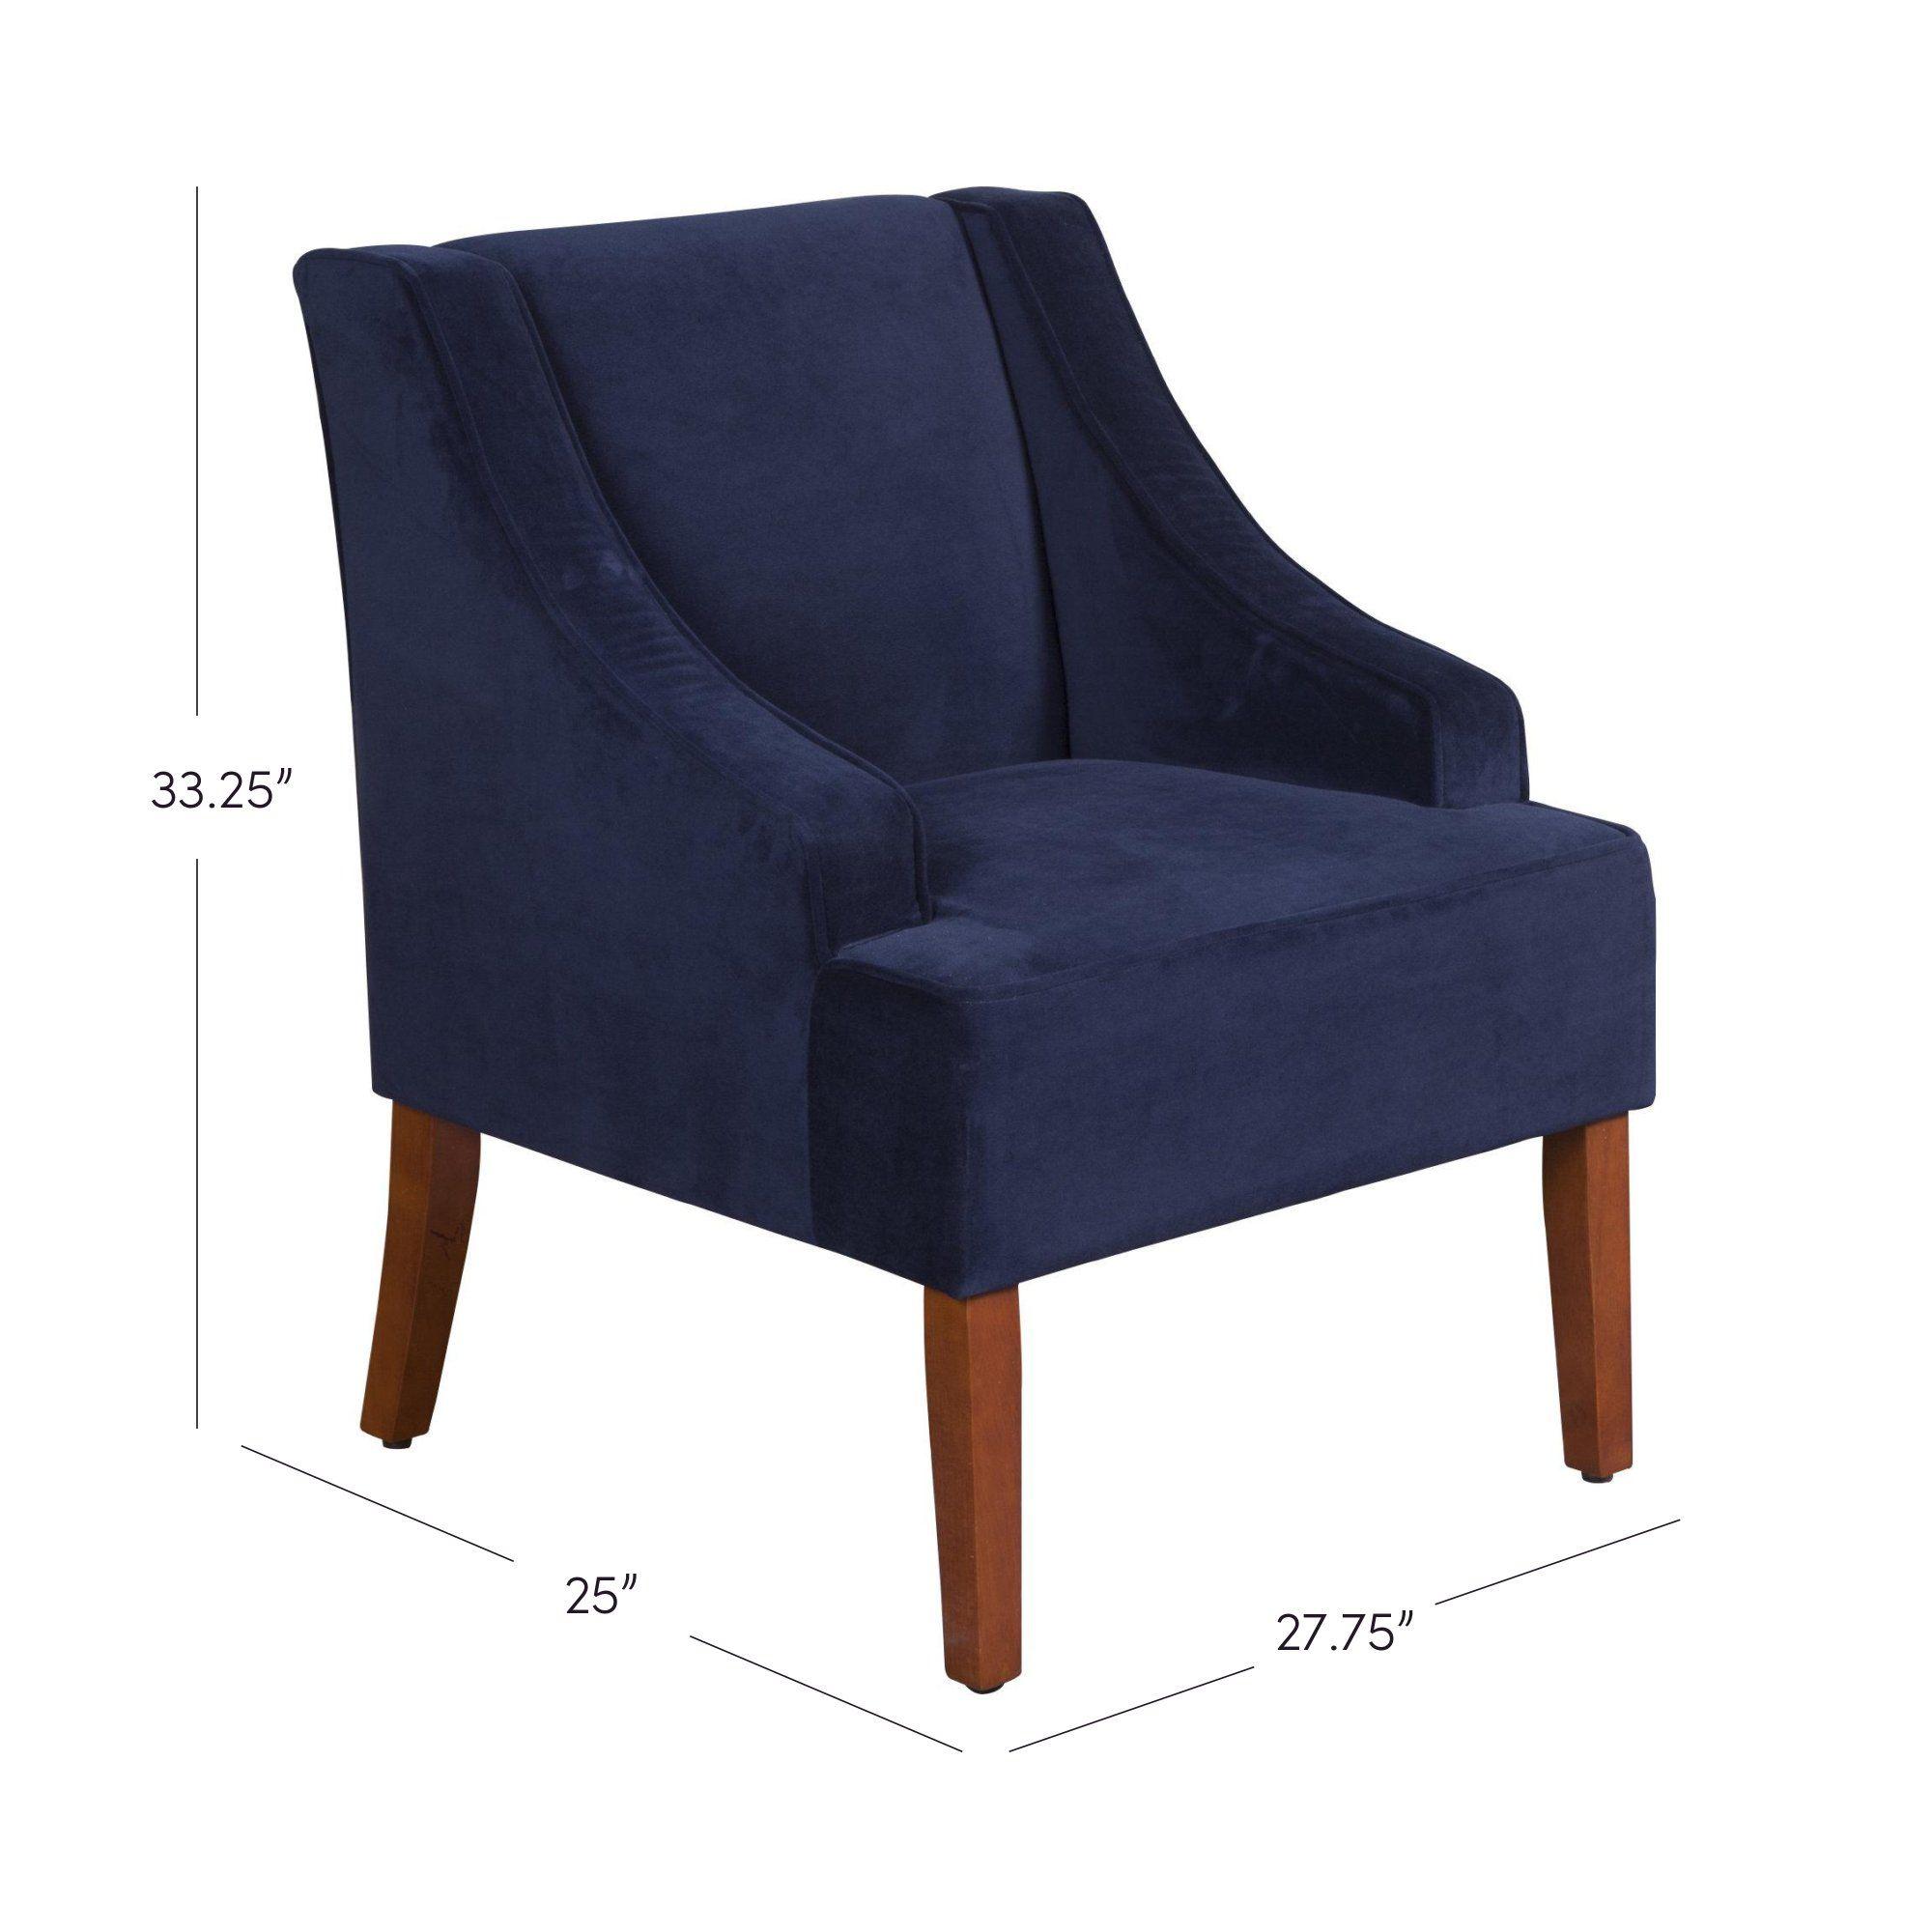 Astounding Krantz Swoop Armchair Future Casa Velvet Accent Chair Evergreenethics Interior Chair Design Evergreenethicsorg